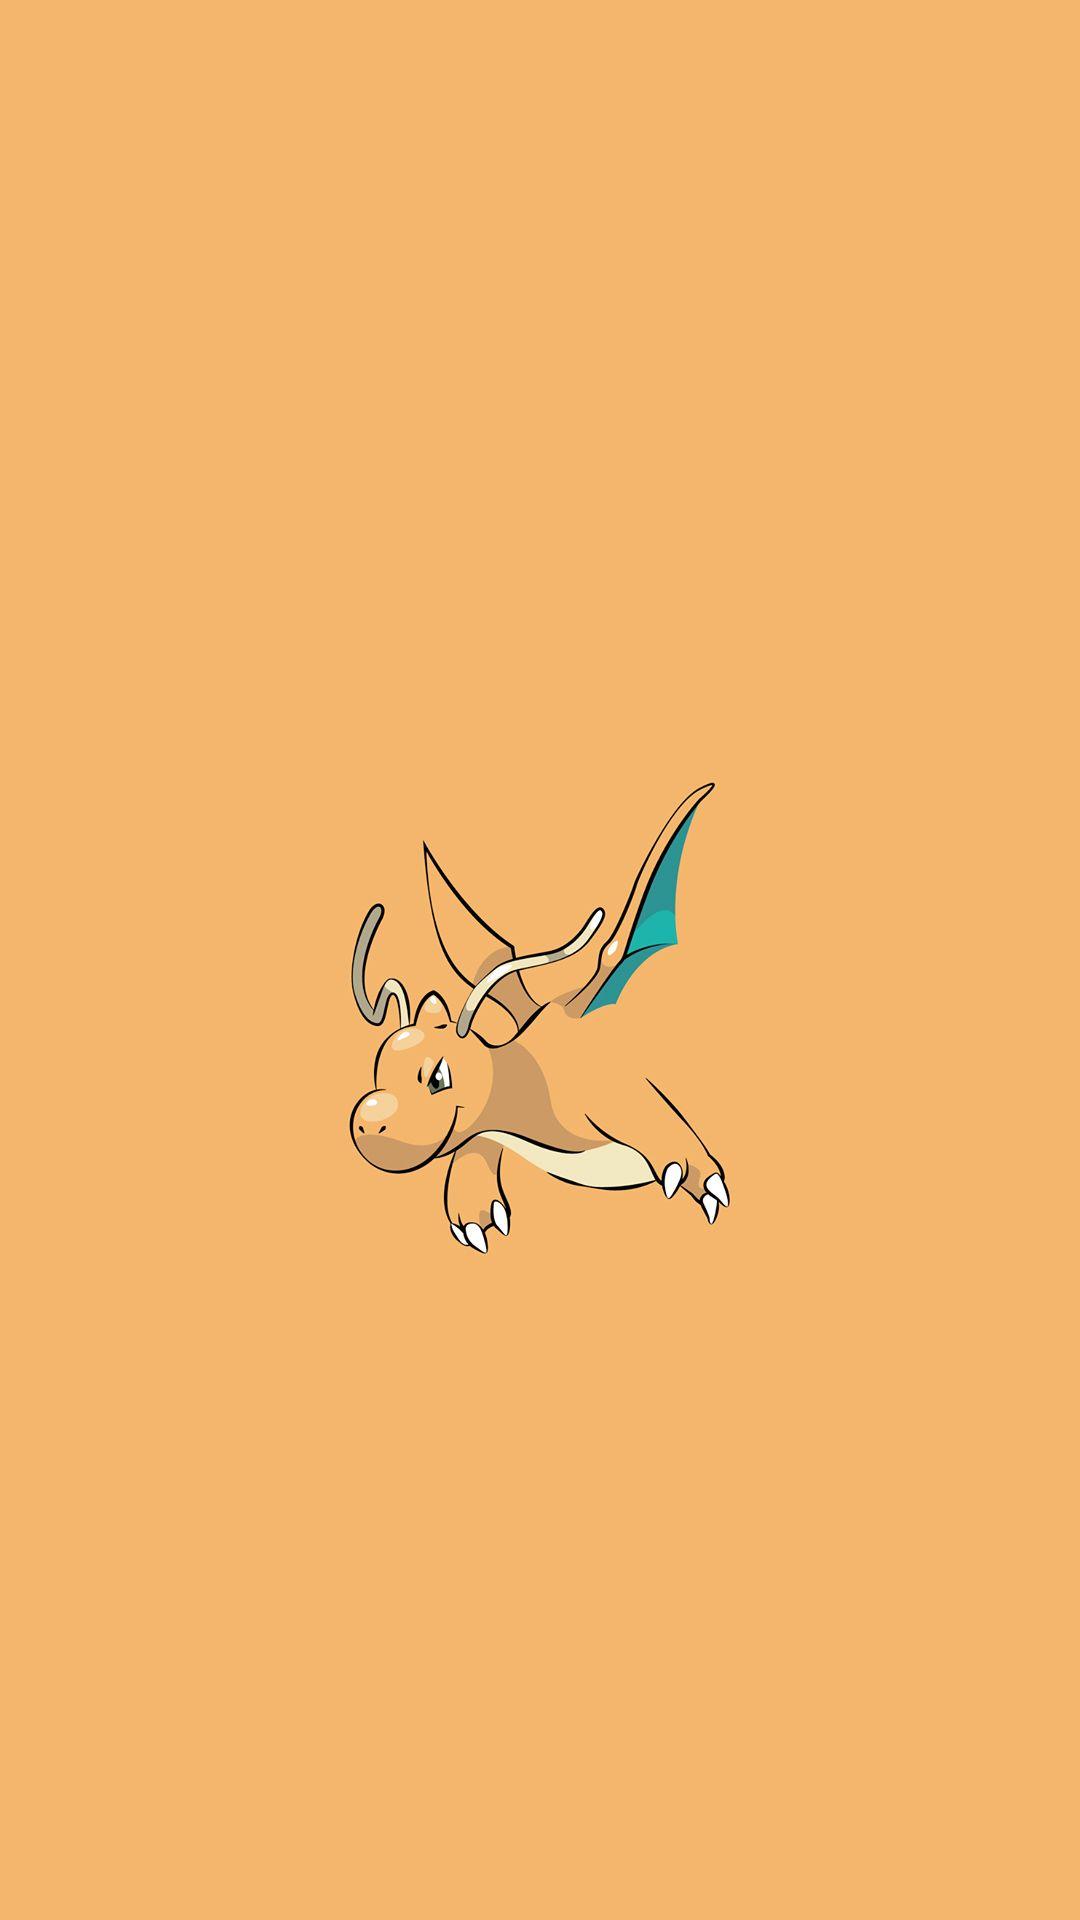 Dragonite Pokemon Character iPhone 6+ HD Wallpaper (1) – http …